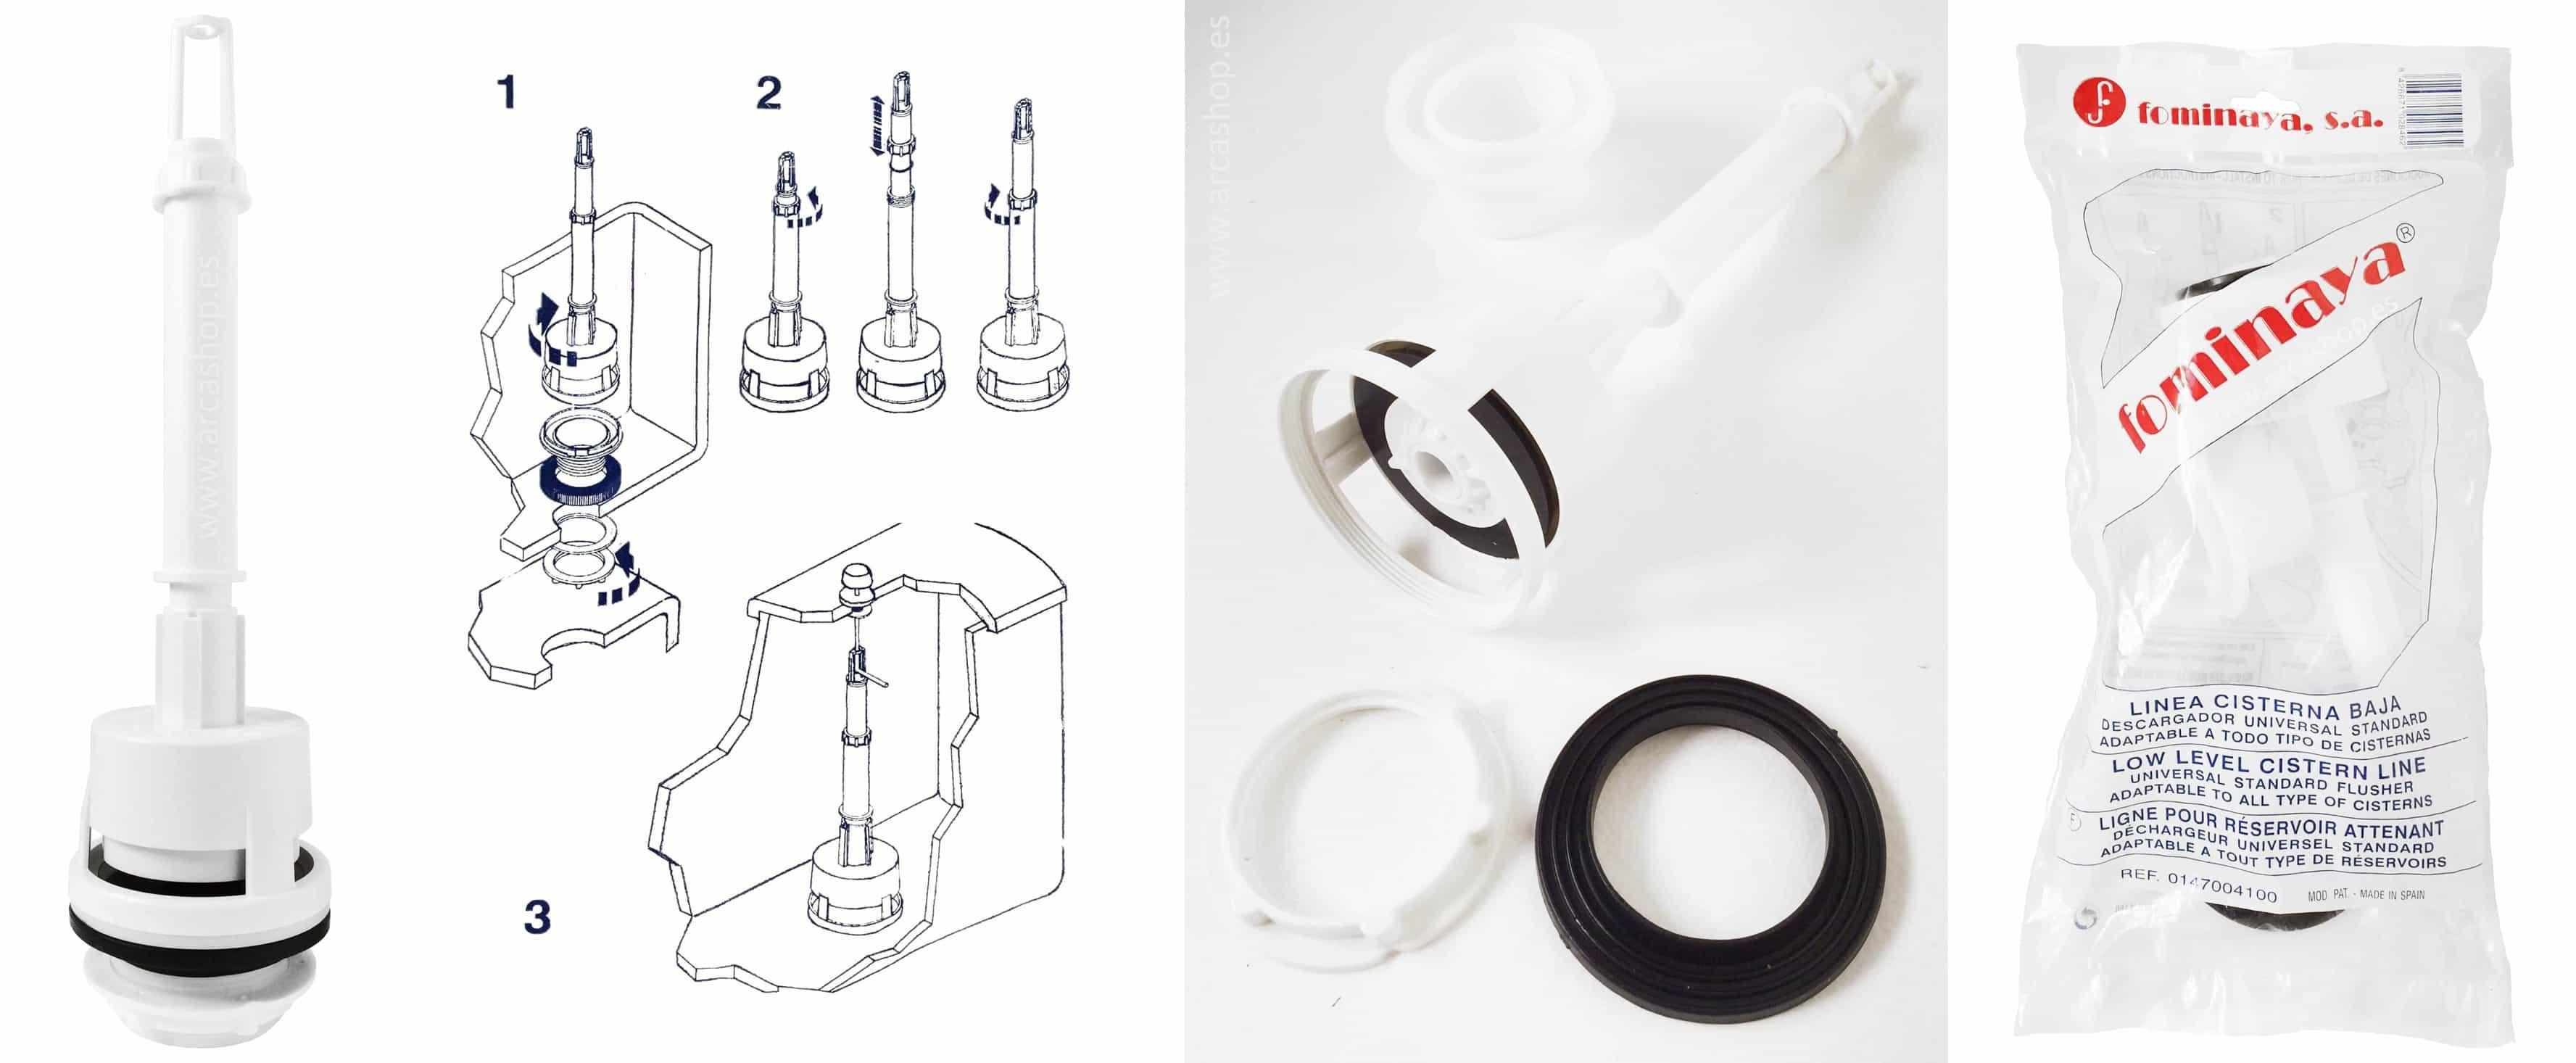 Descargador cisternas universal standard fominaya for Cisternas wc precios